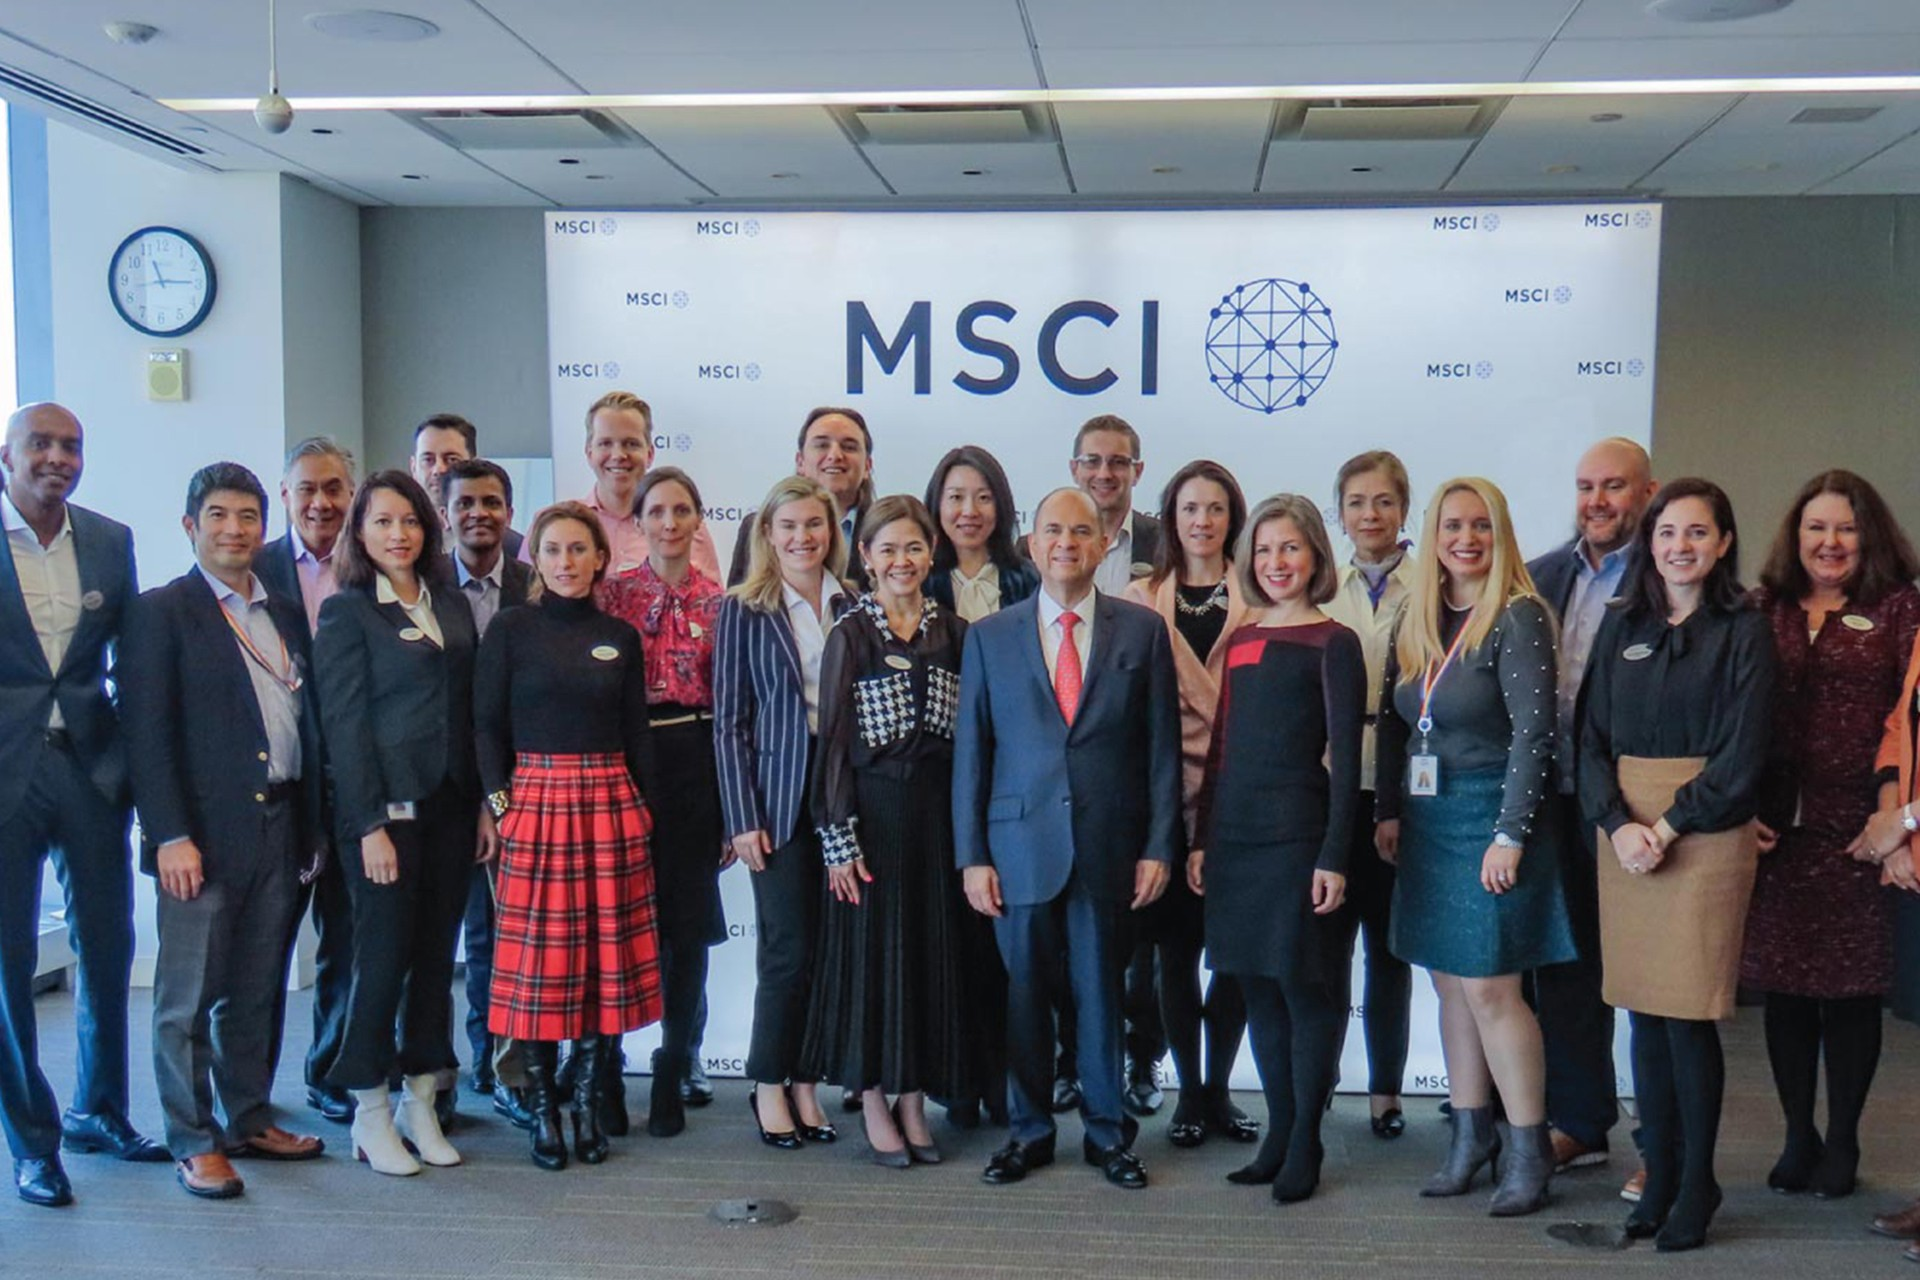 MSCI Jobs and Company Culture